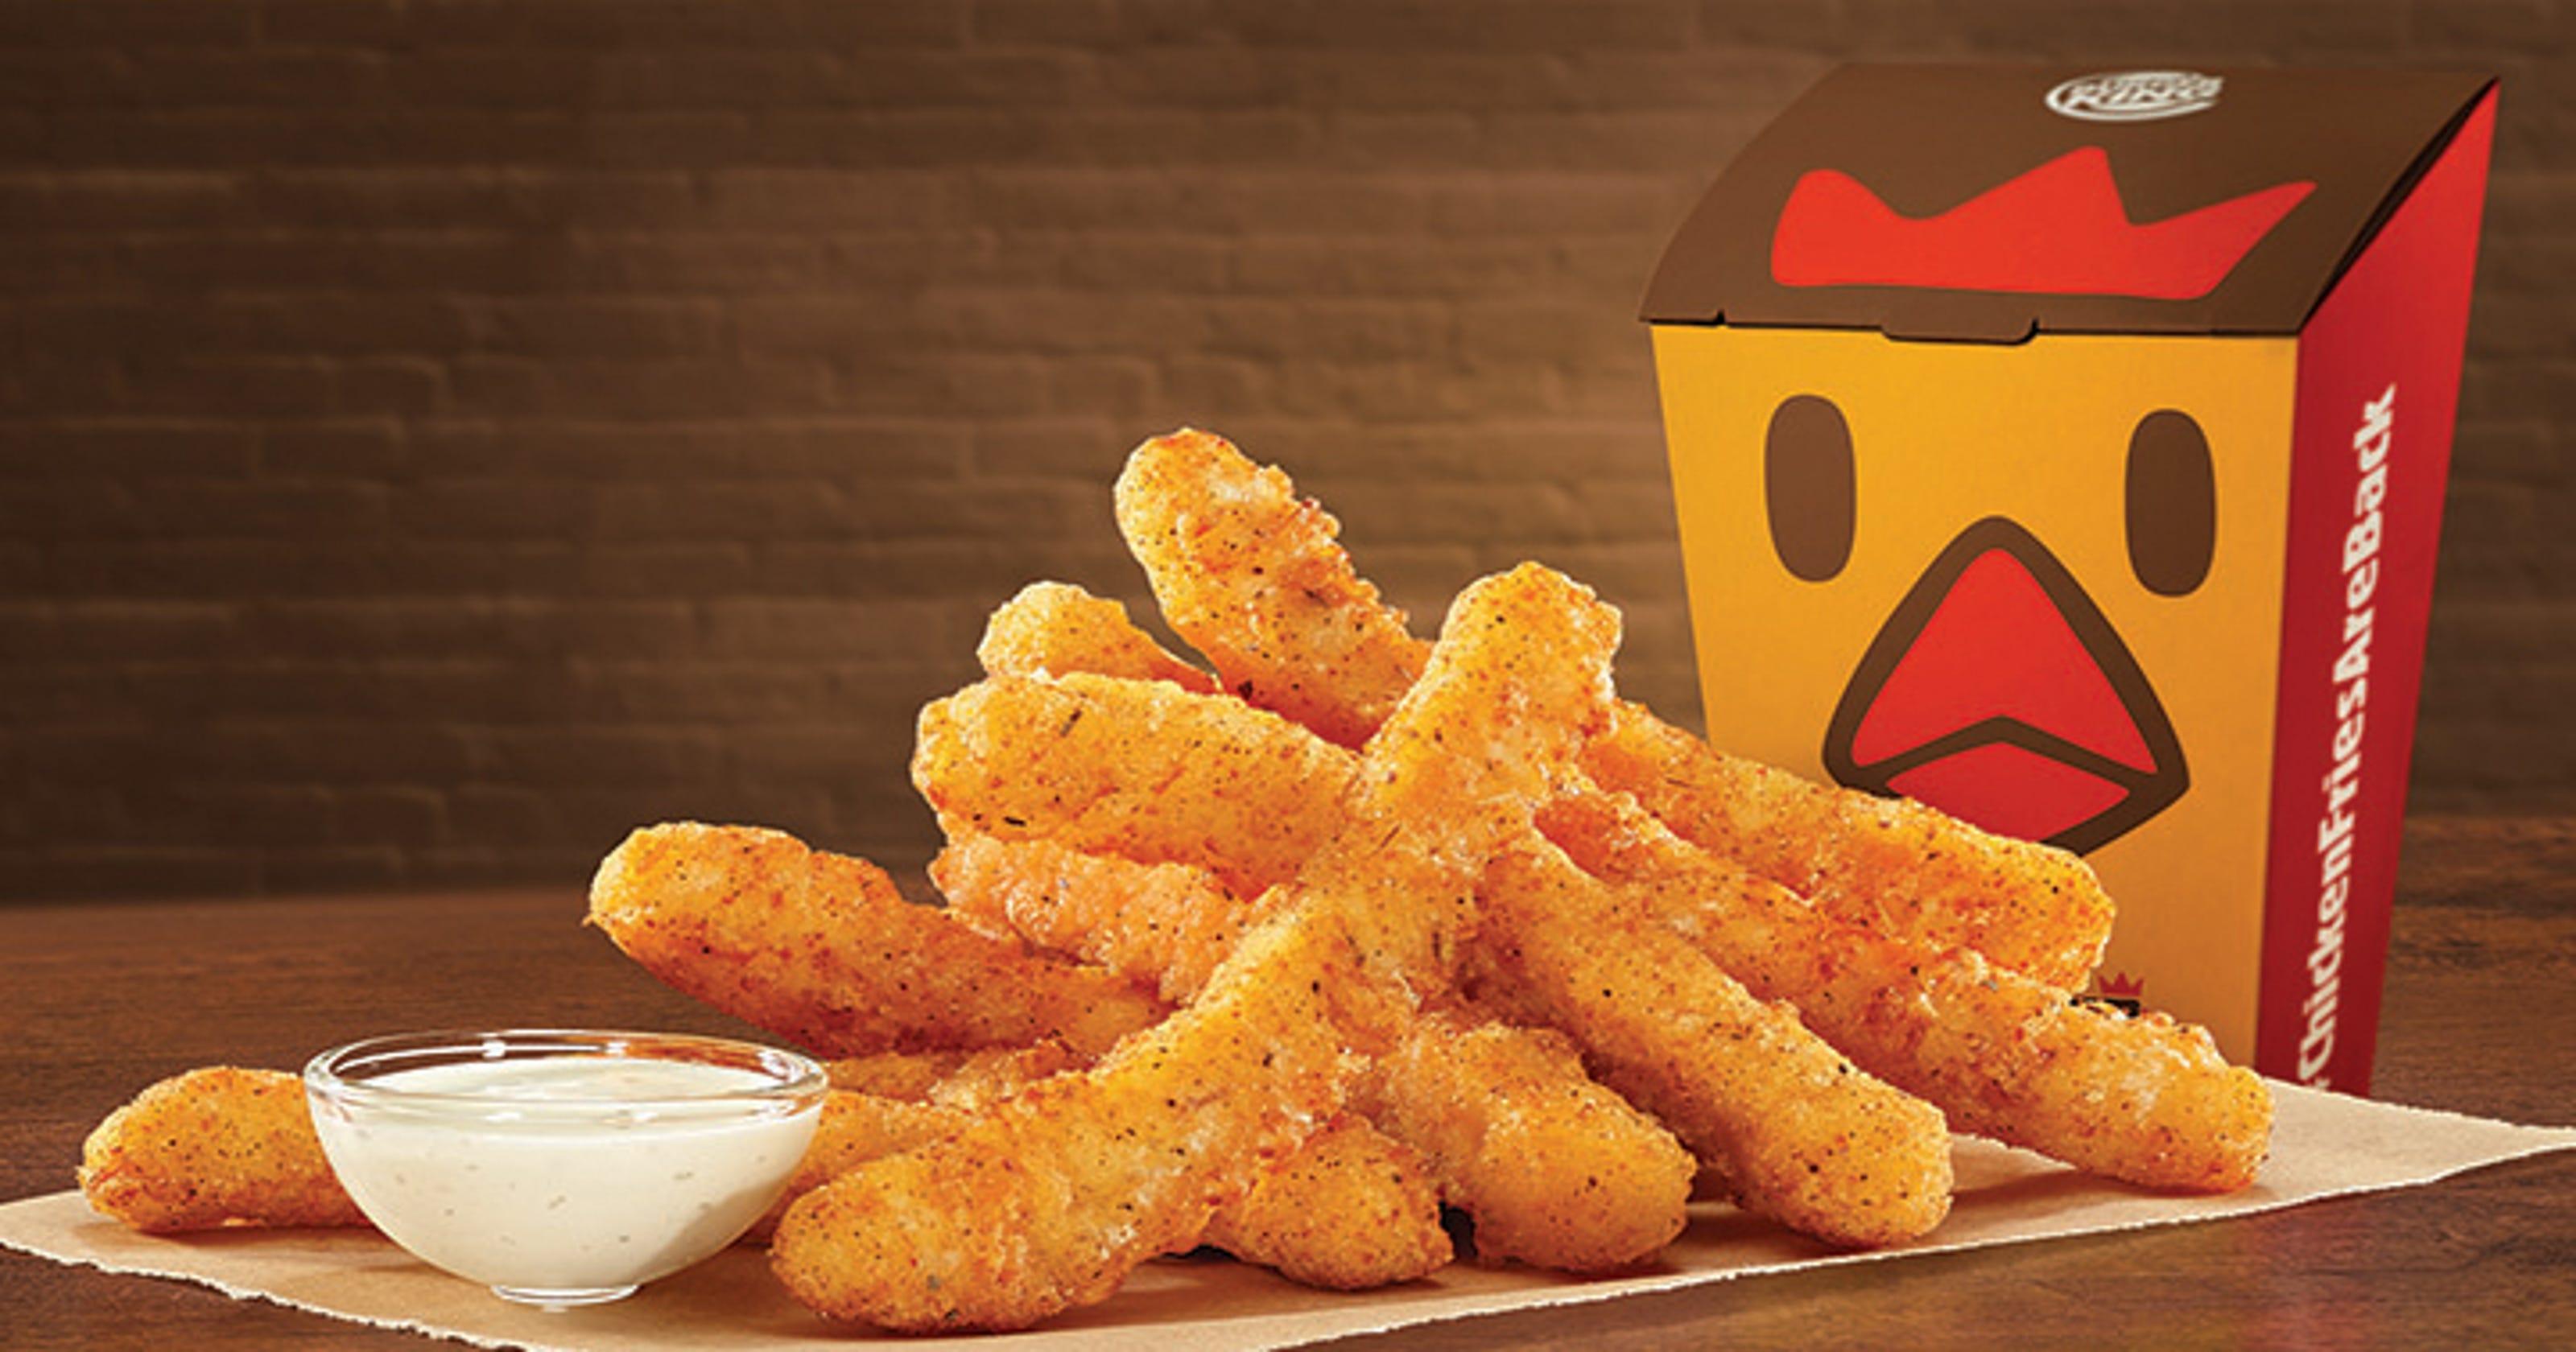 Burger King Chicken Fries Permanent